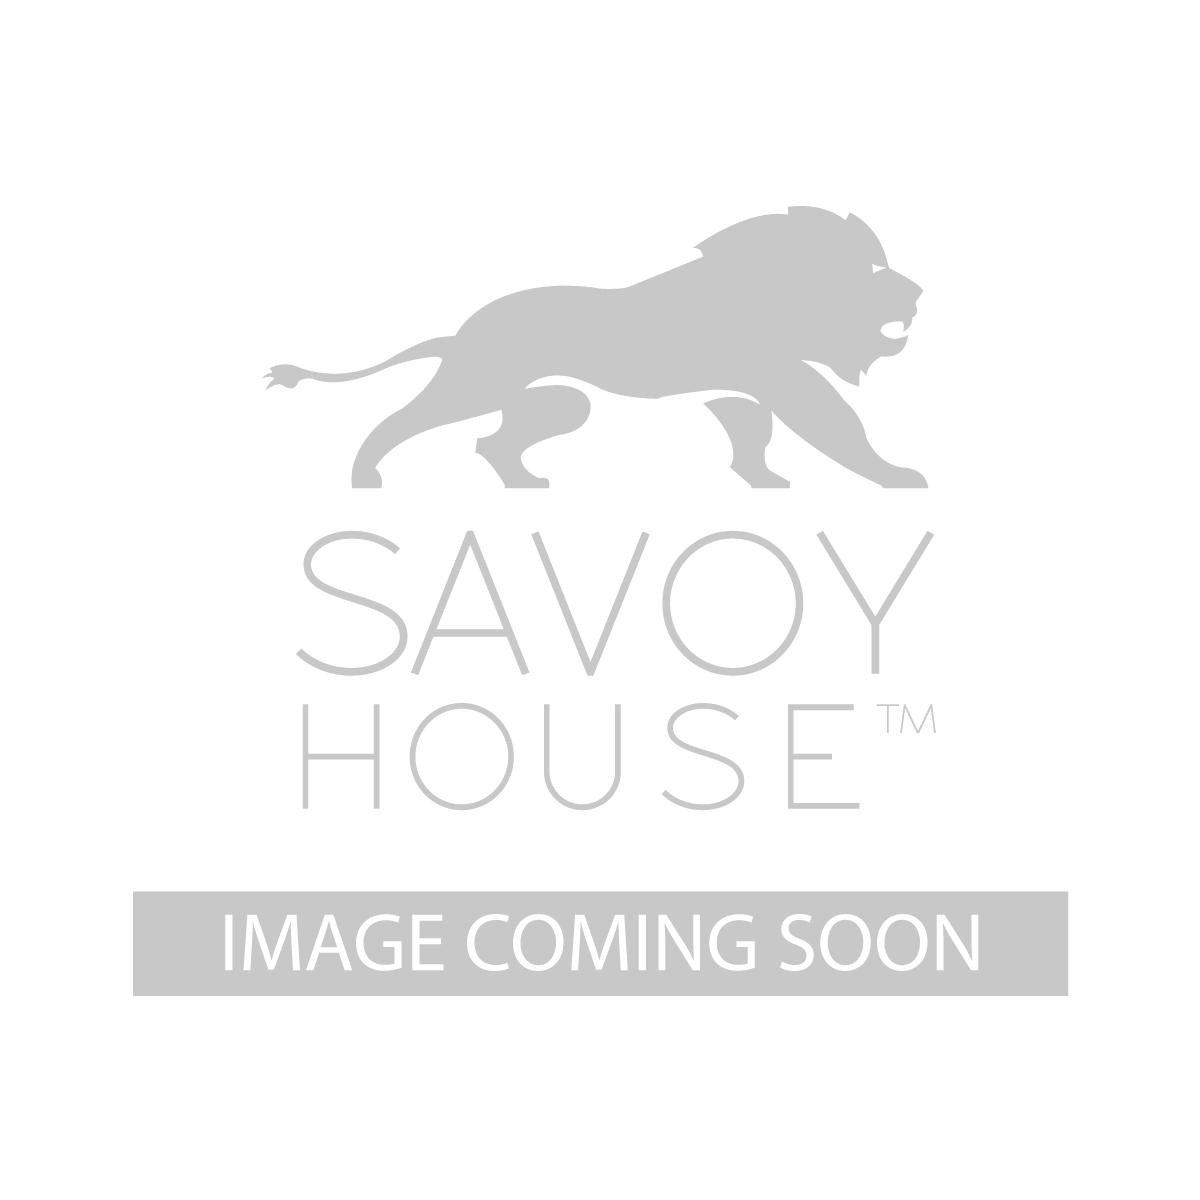 6 5450 16 13 Flush Mount By Savoy House